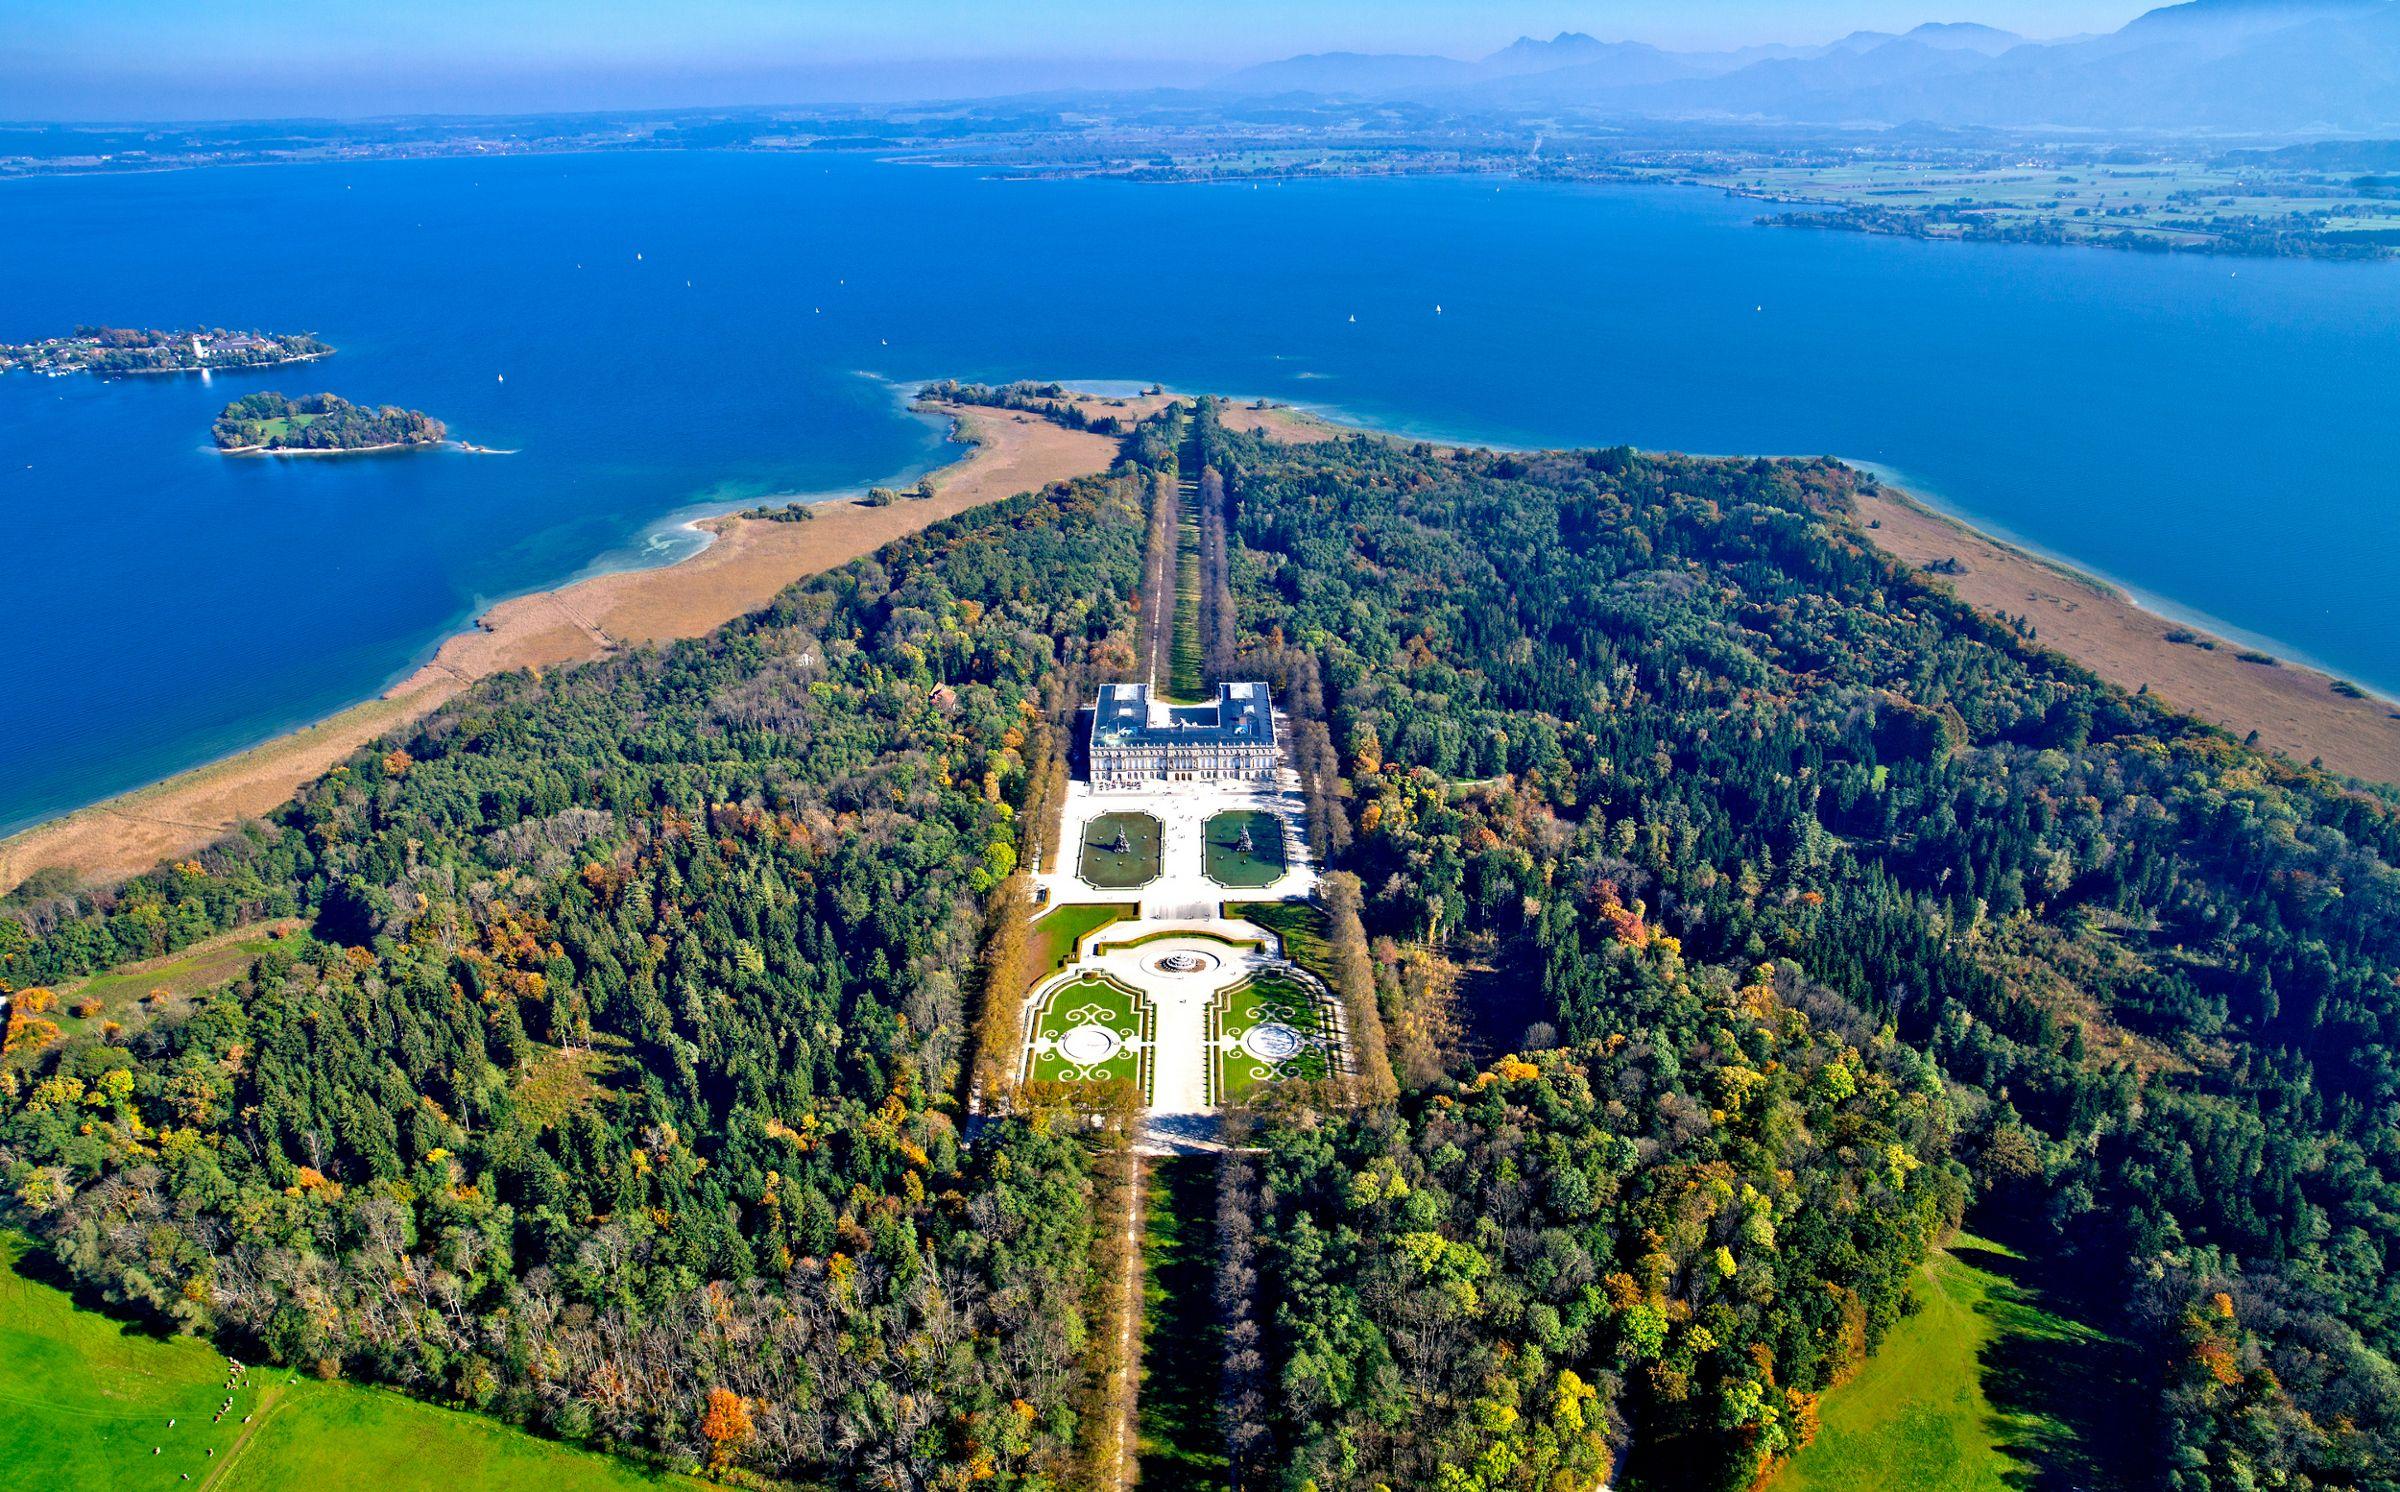 Herreninsel Herrenchiemsee Visit Munich Amazing Destinations Castle Bavaria